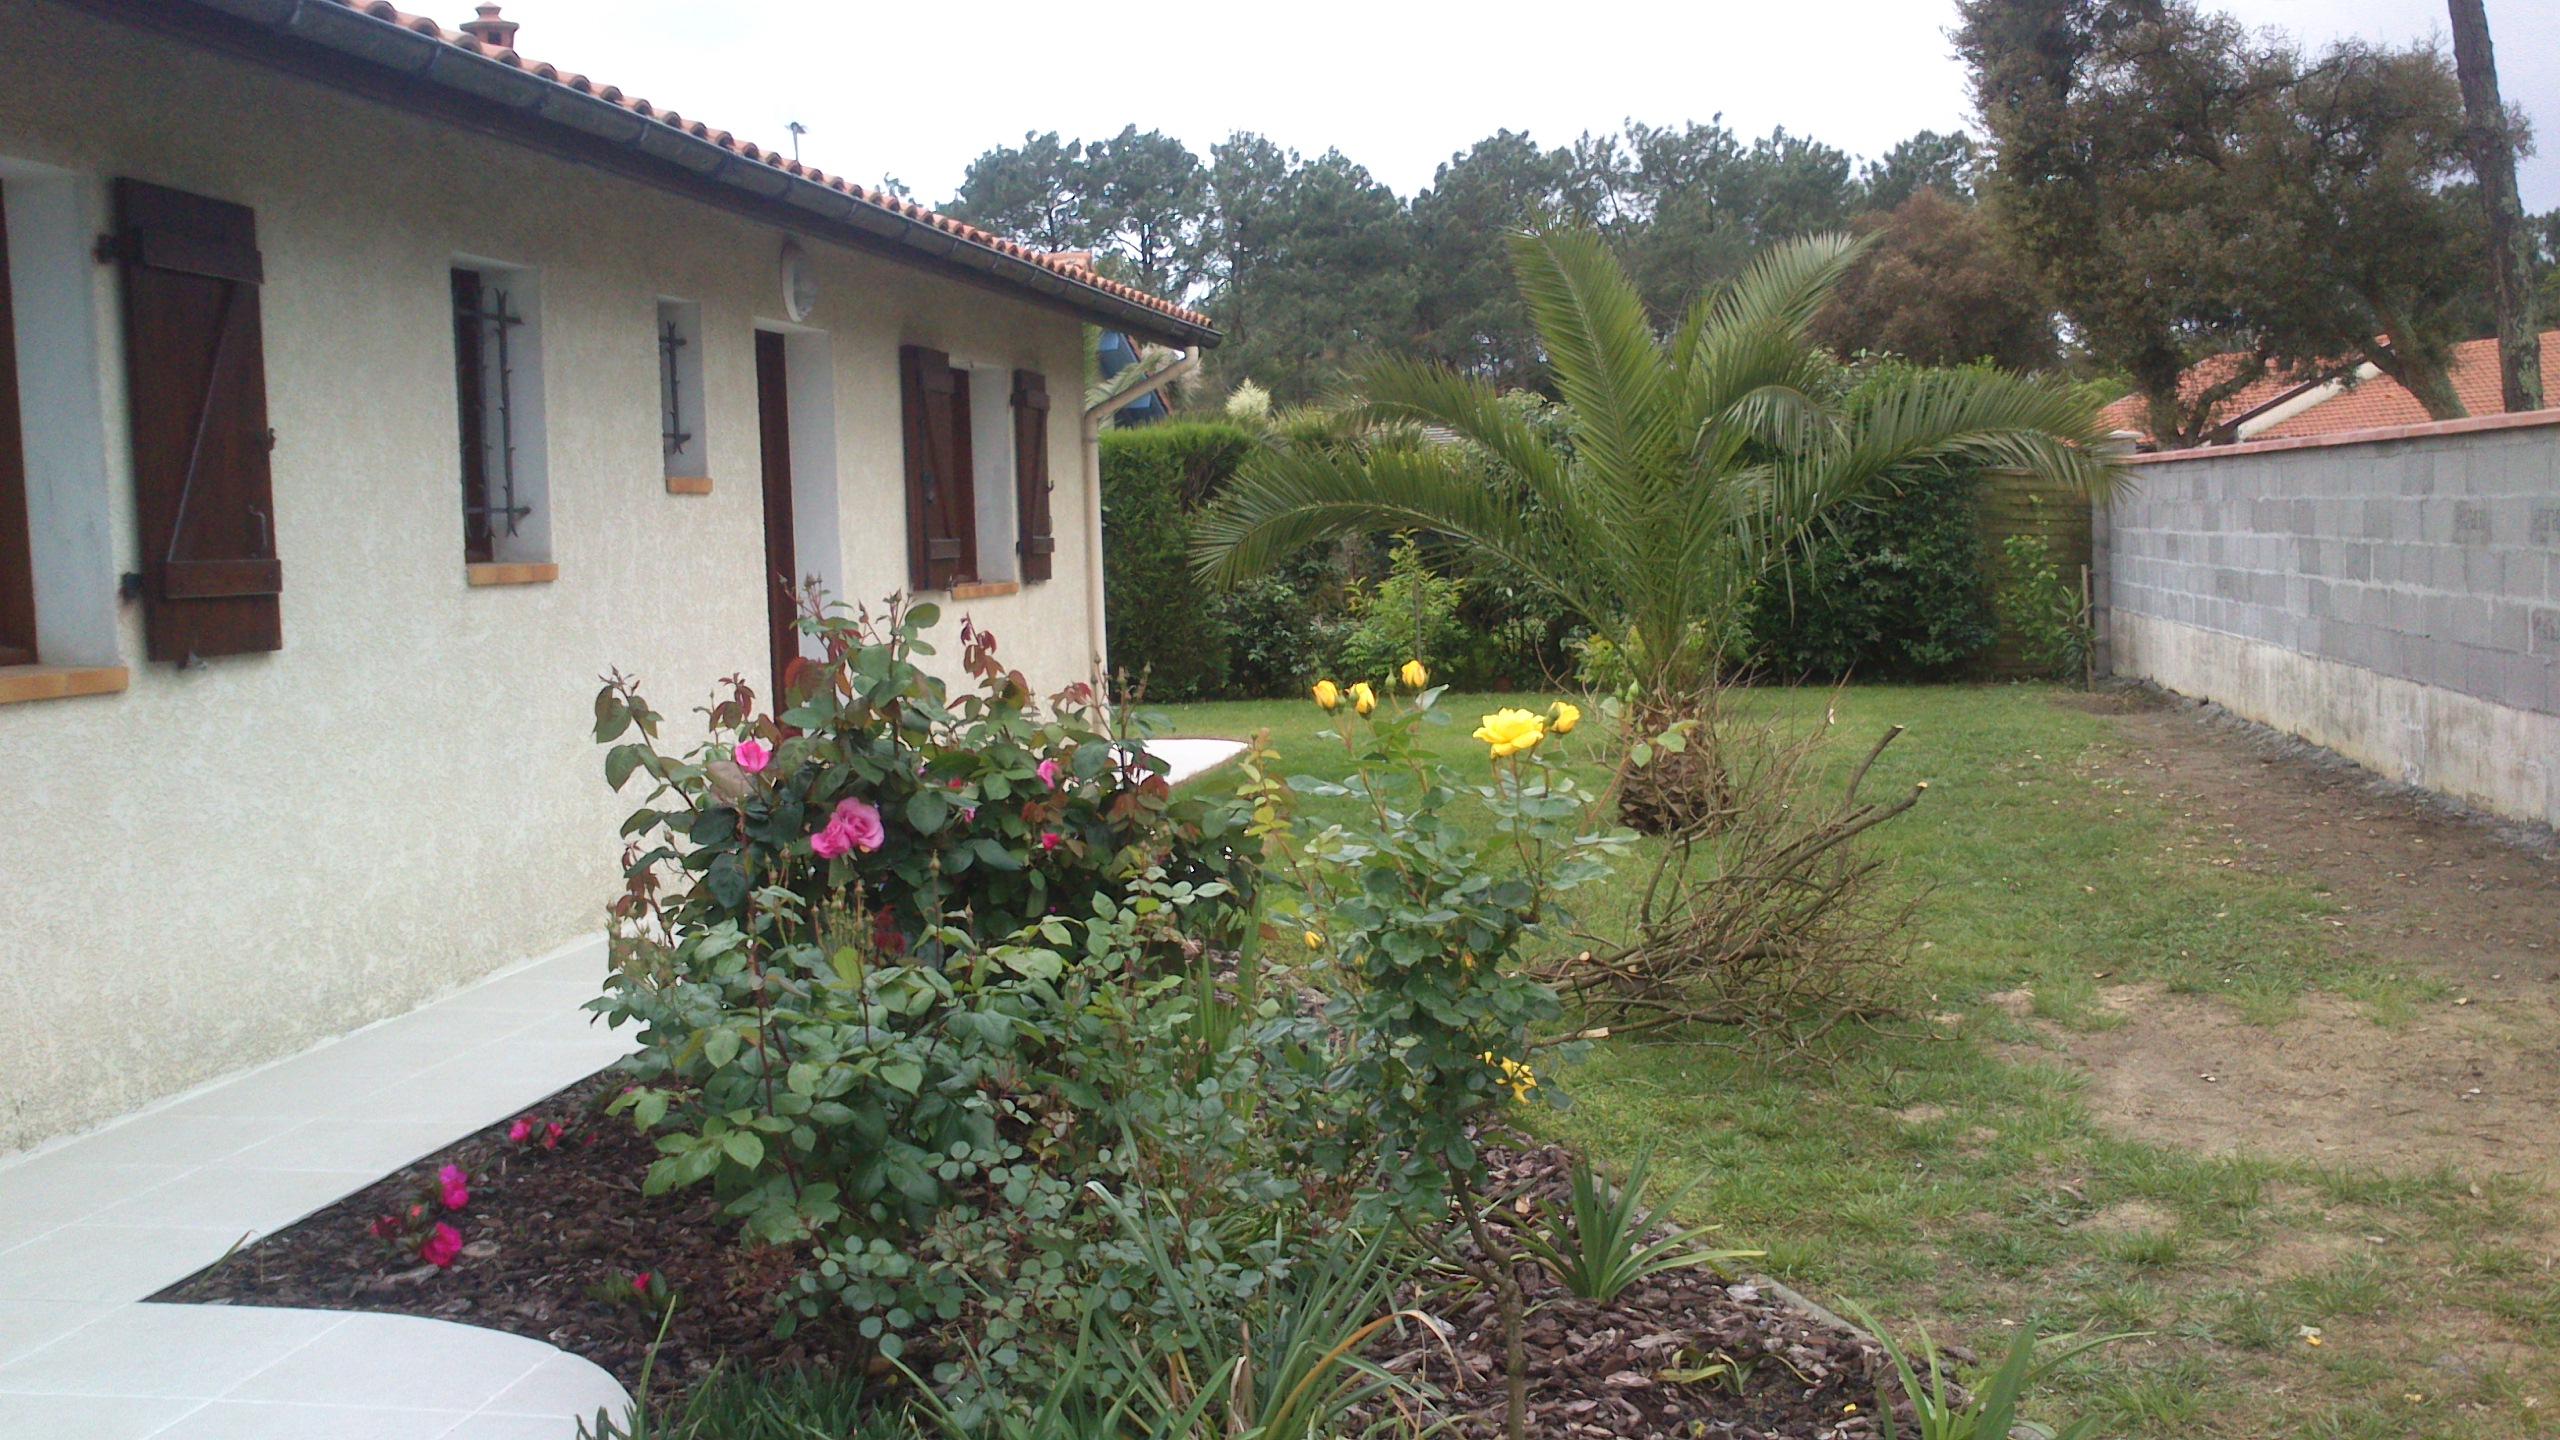 am nagement jardin biarritz capbreton bayonne paysagiste bon plan jardin. Black Bedroom Furniture Sets. Home Design Ideas